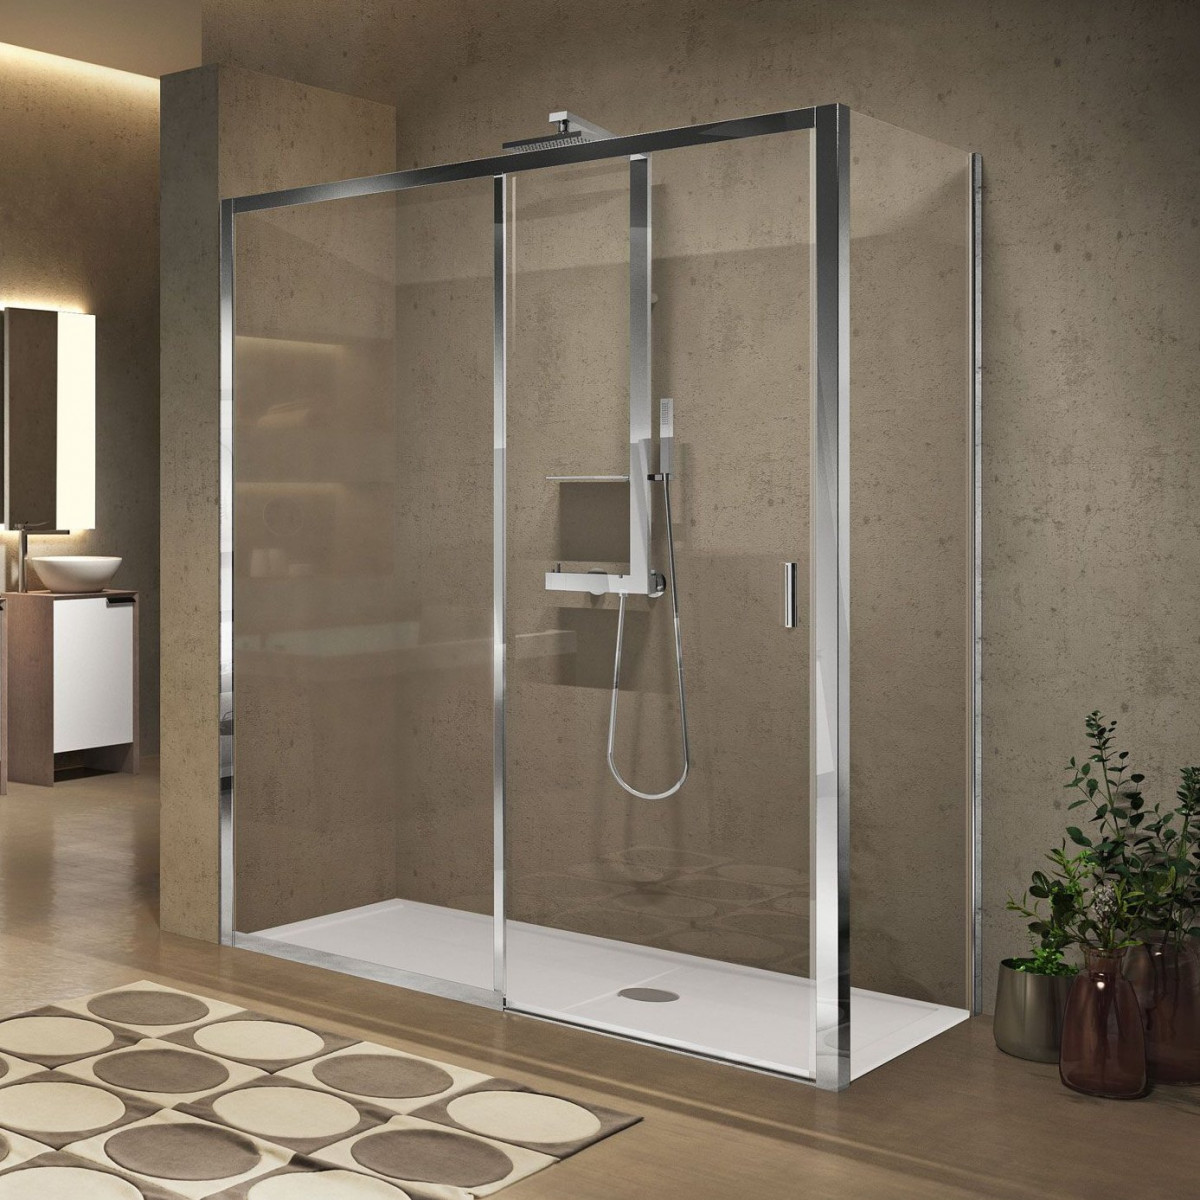 Novellini Lunes 2 0 2p 1200mm Sliding Shower Door